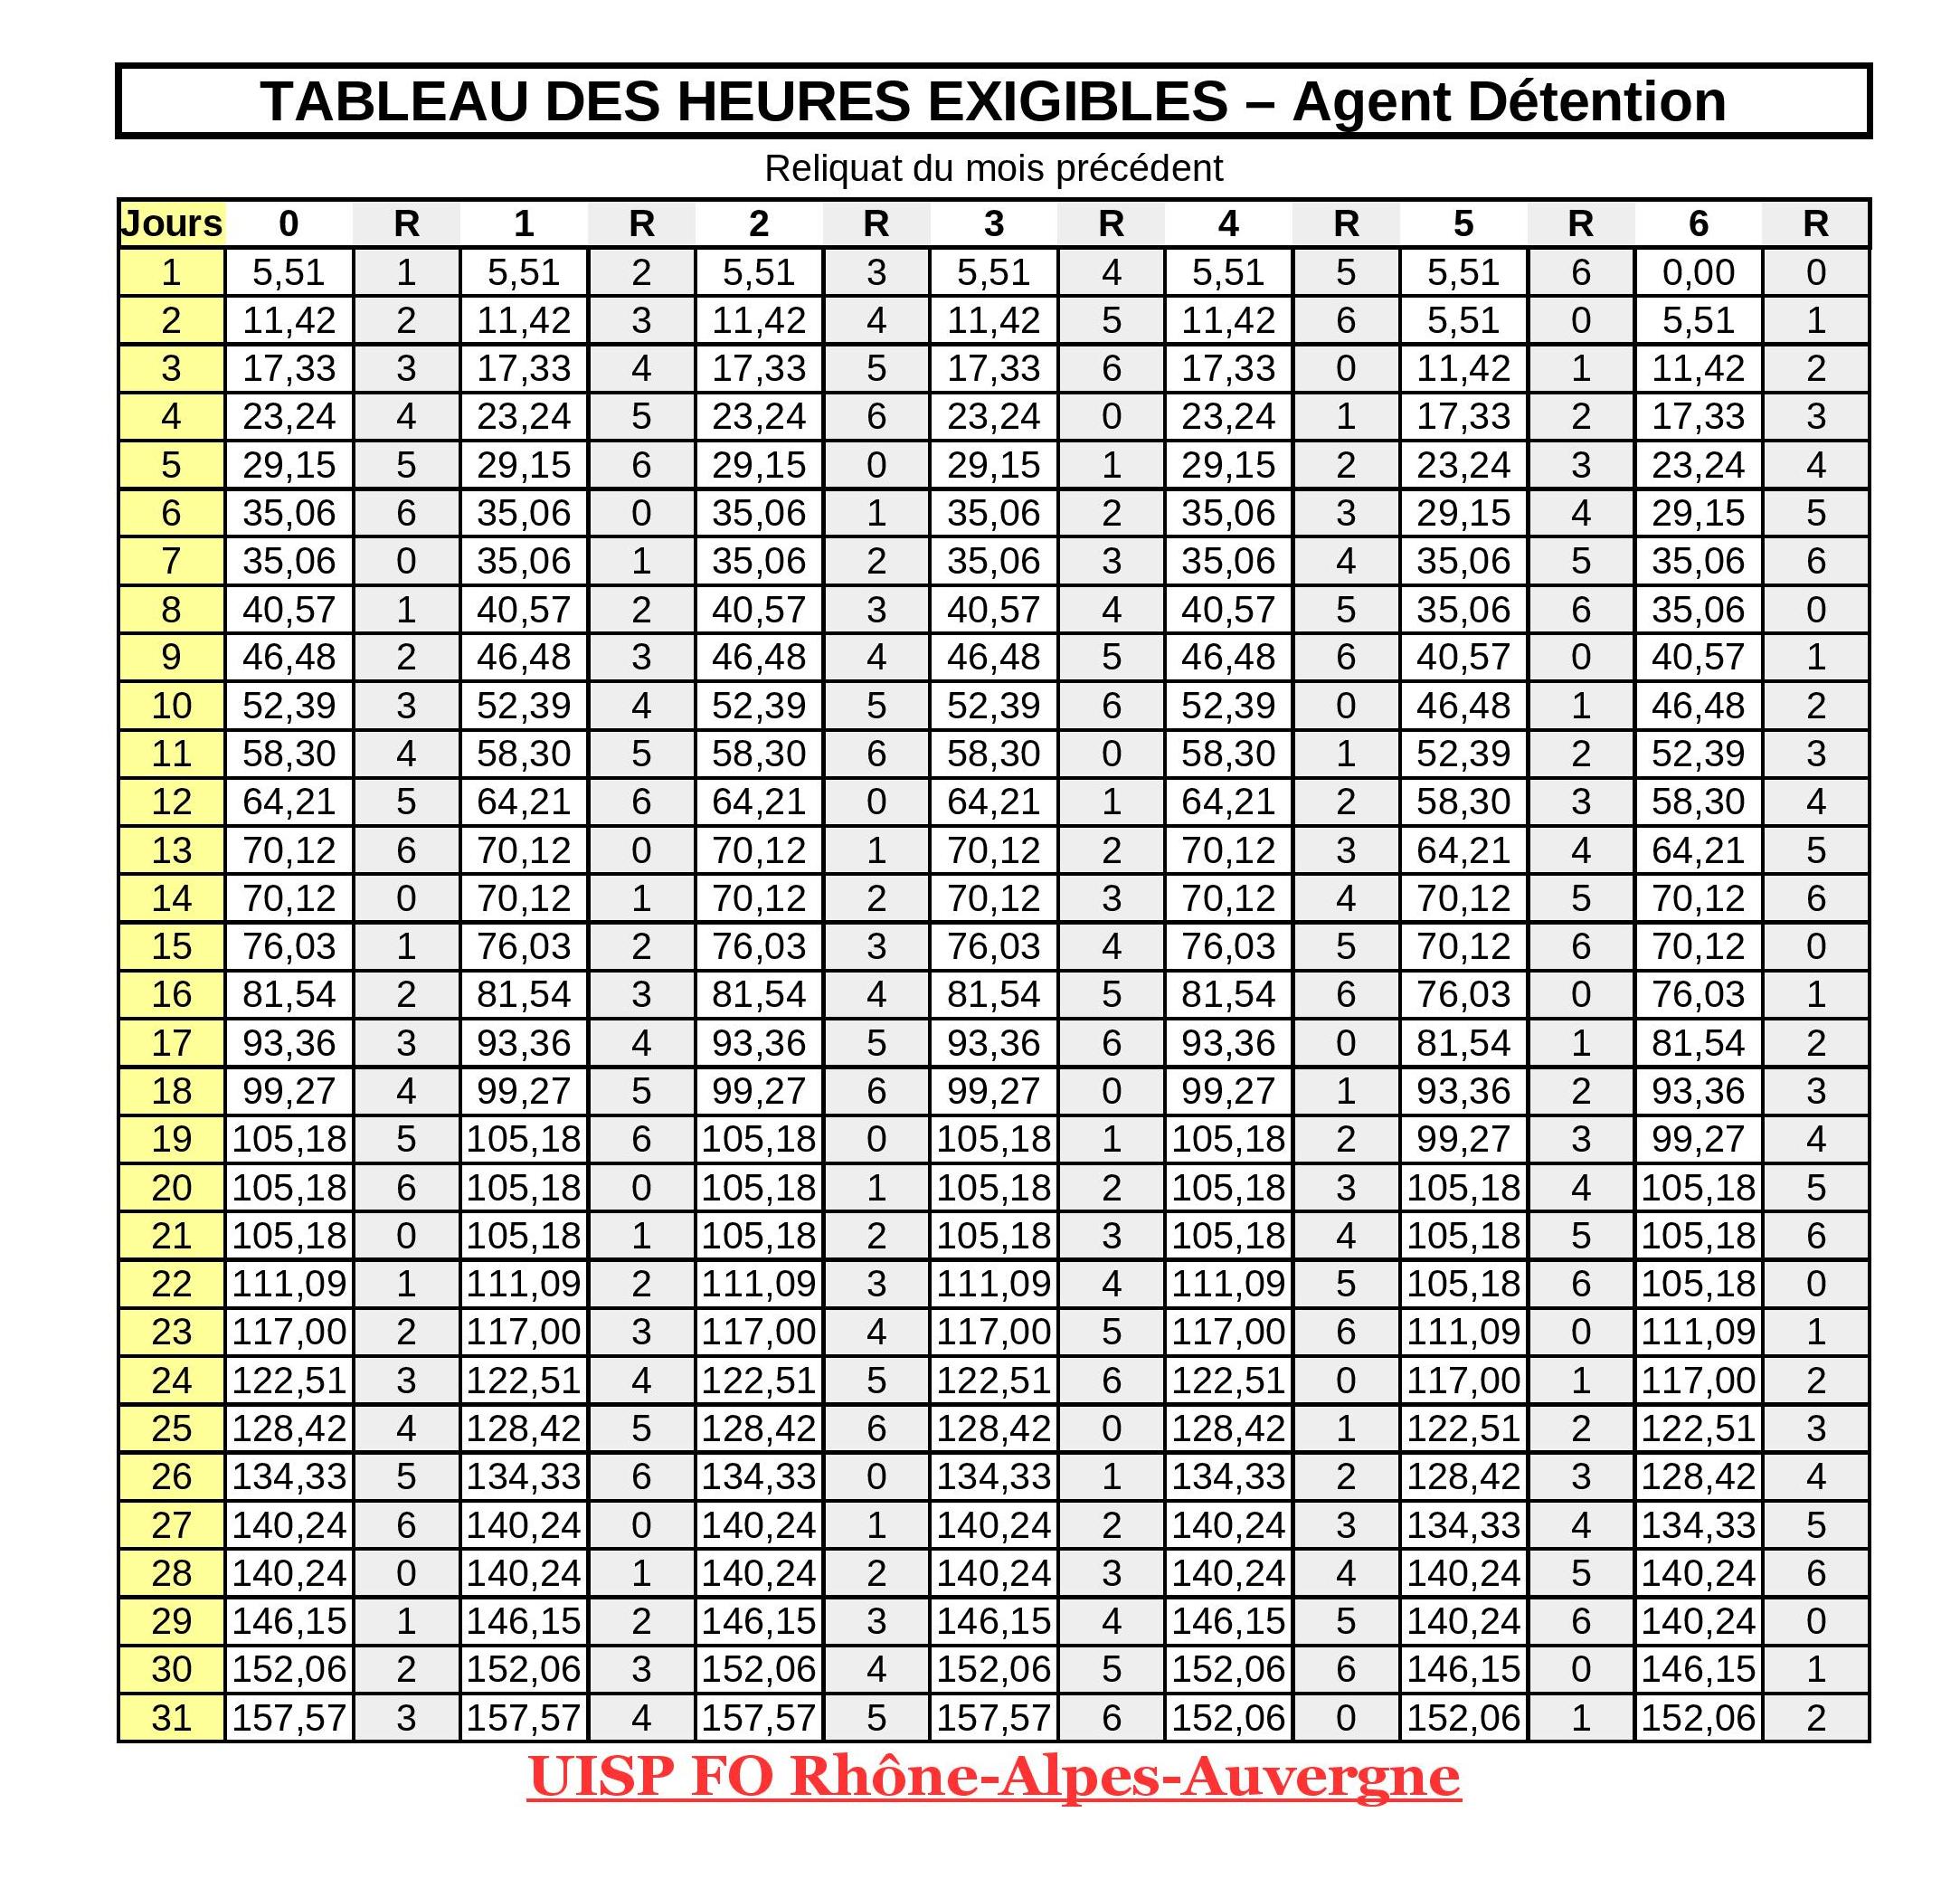 Calcul Heures Exigibles Fo Penitentiaire Uisp Rhone Alpes Auvergne